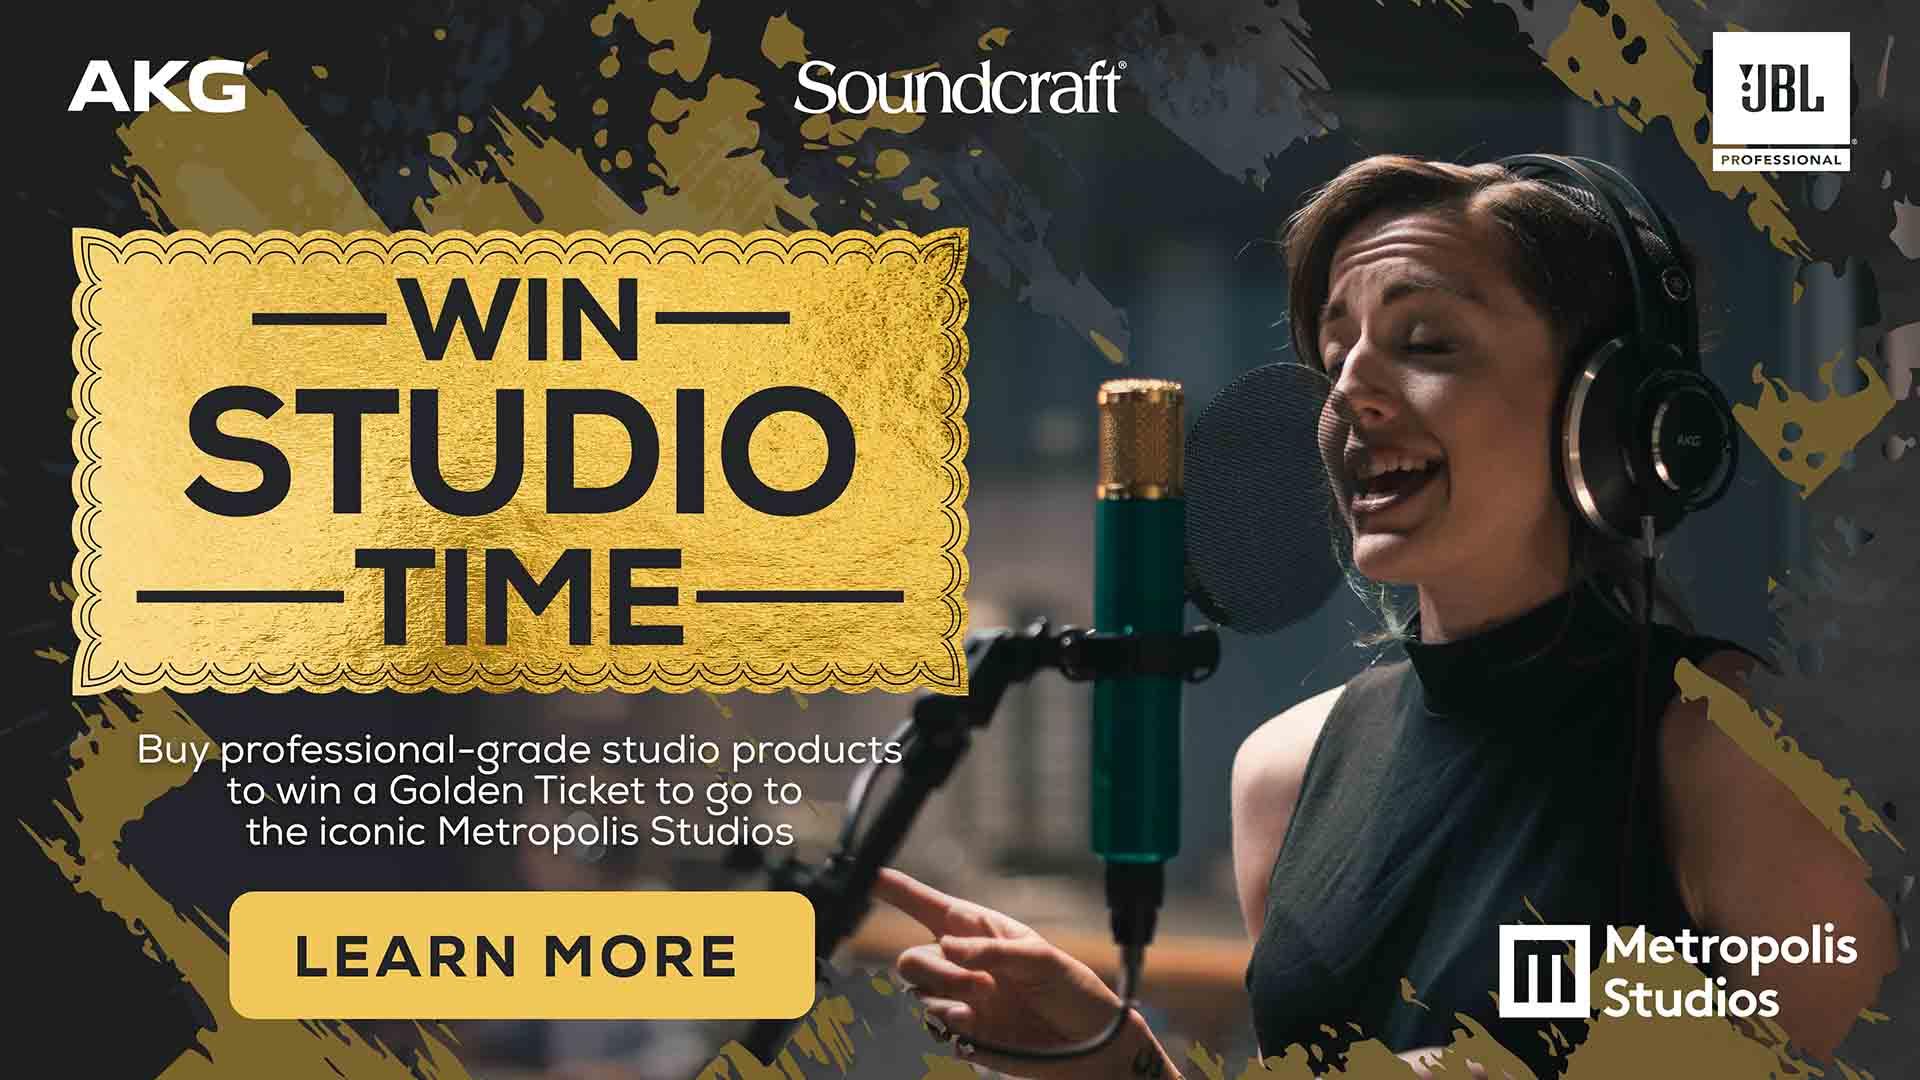 Win A Golden Ticket to Metropolis Studios